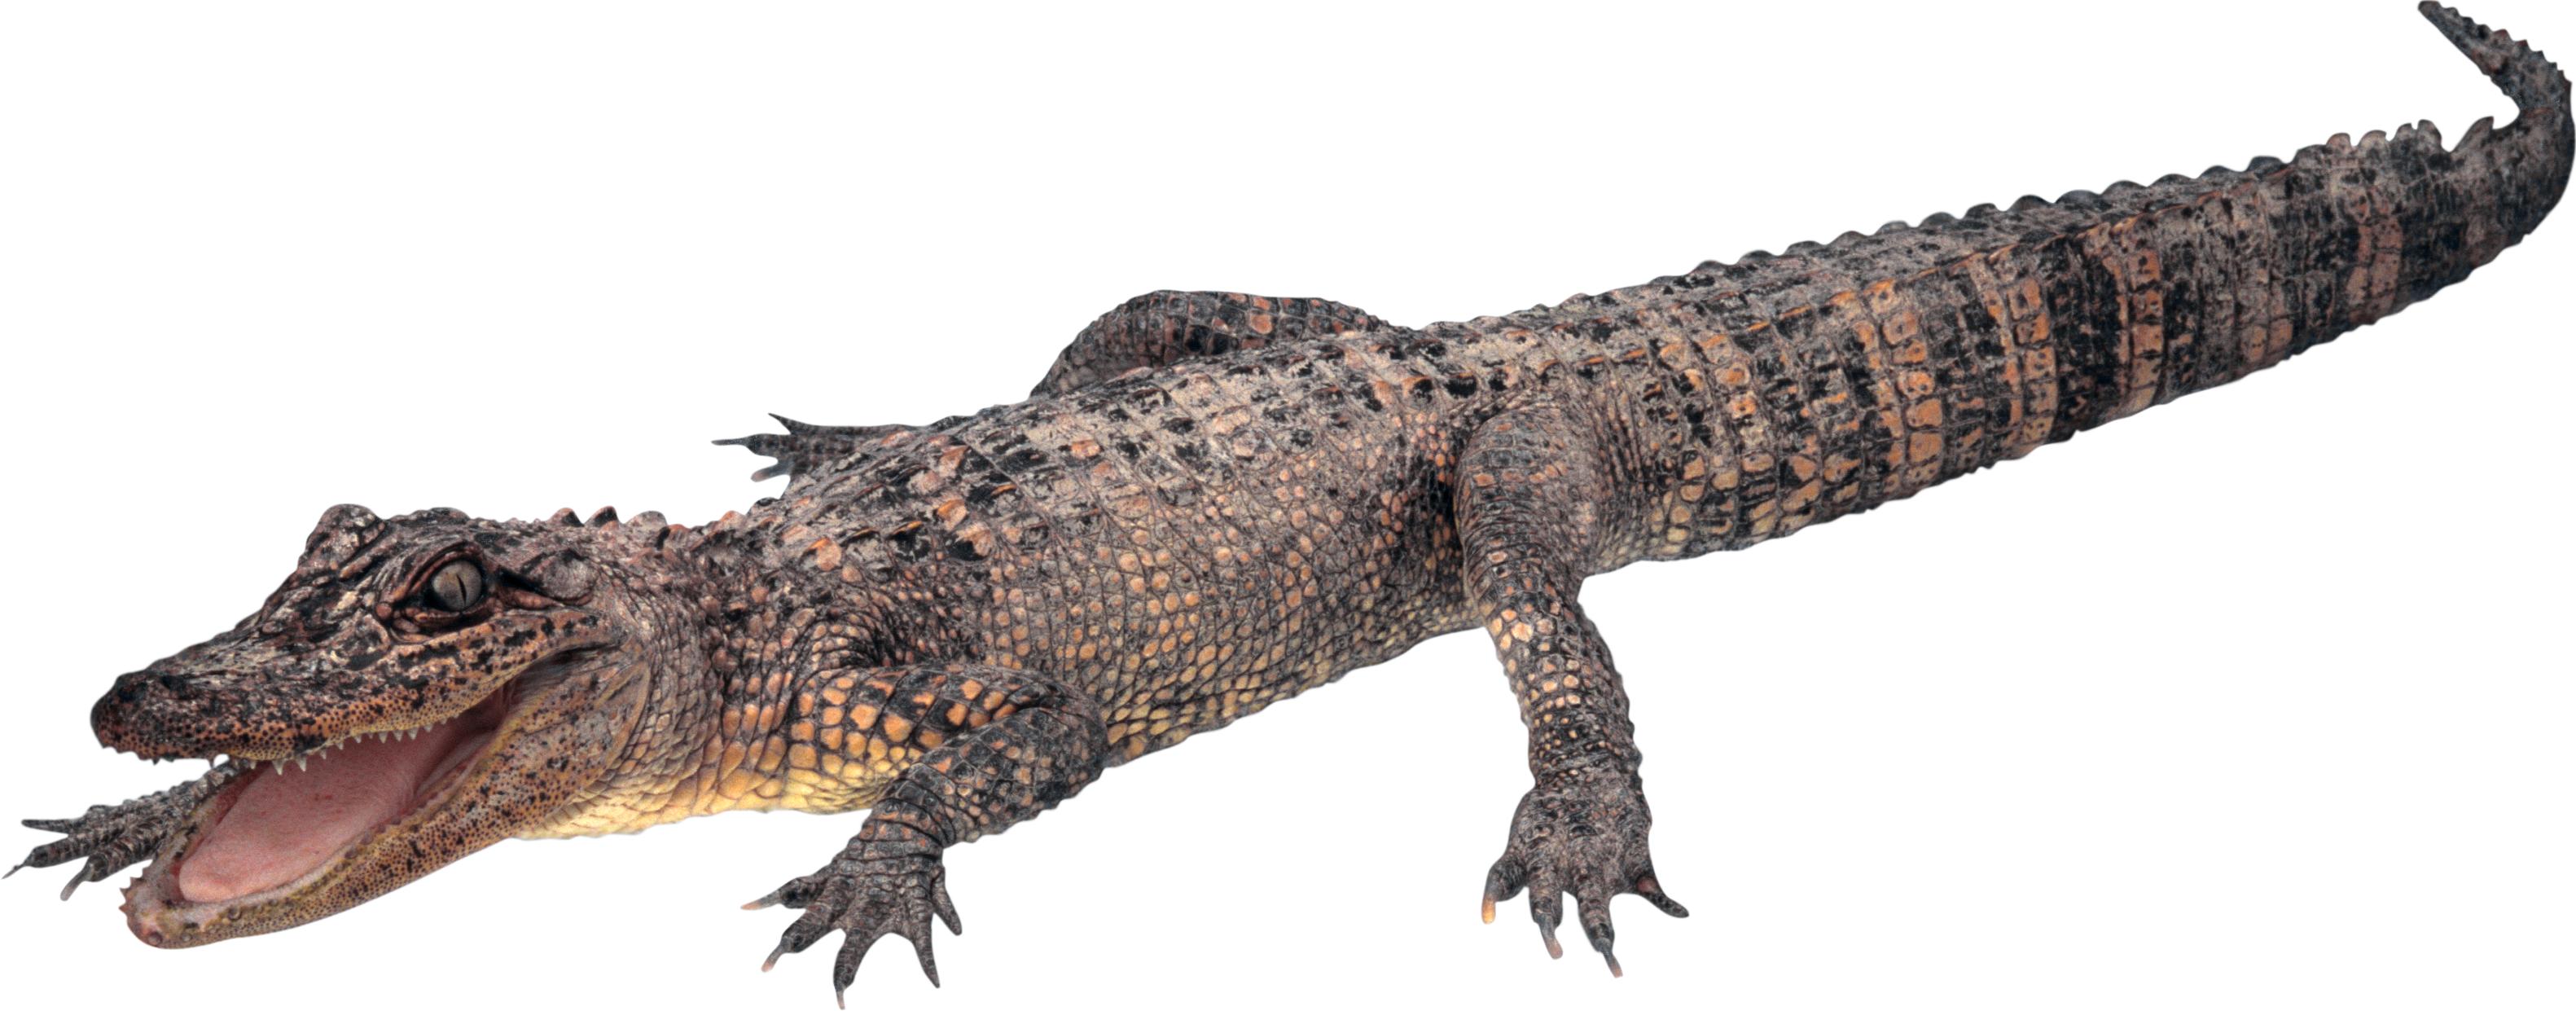 Crocodile, gator PNG